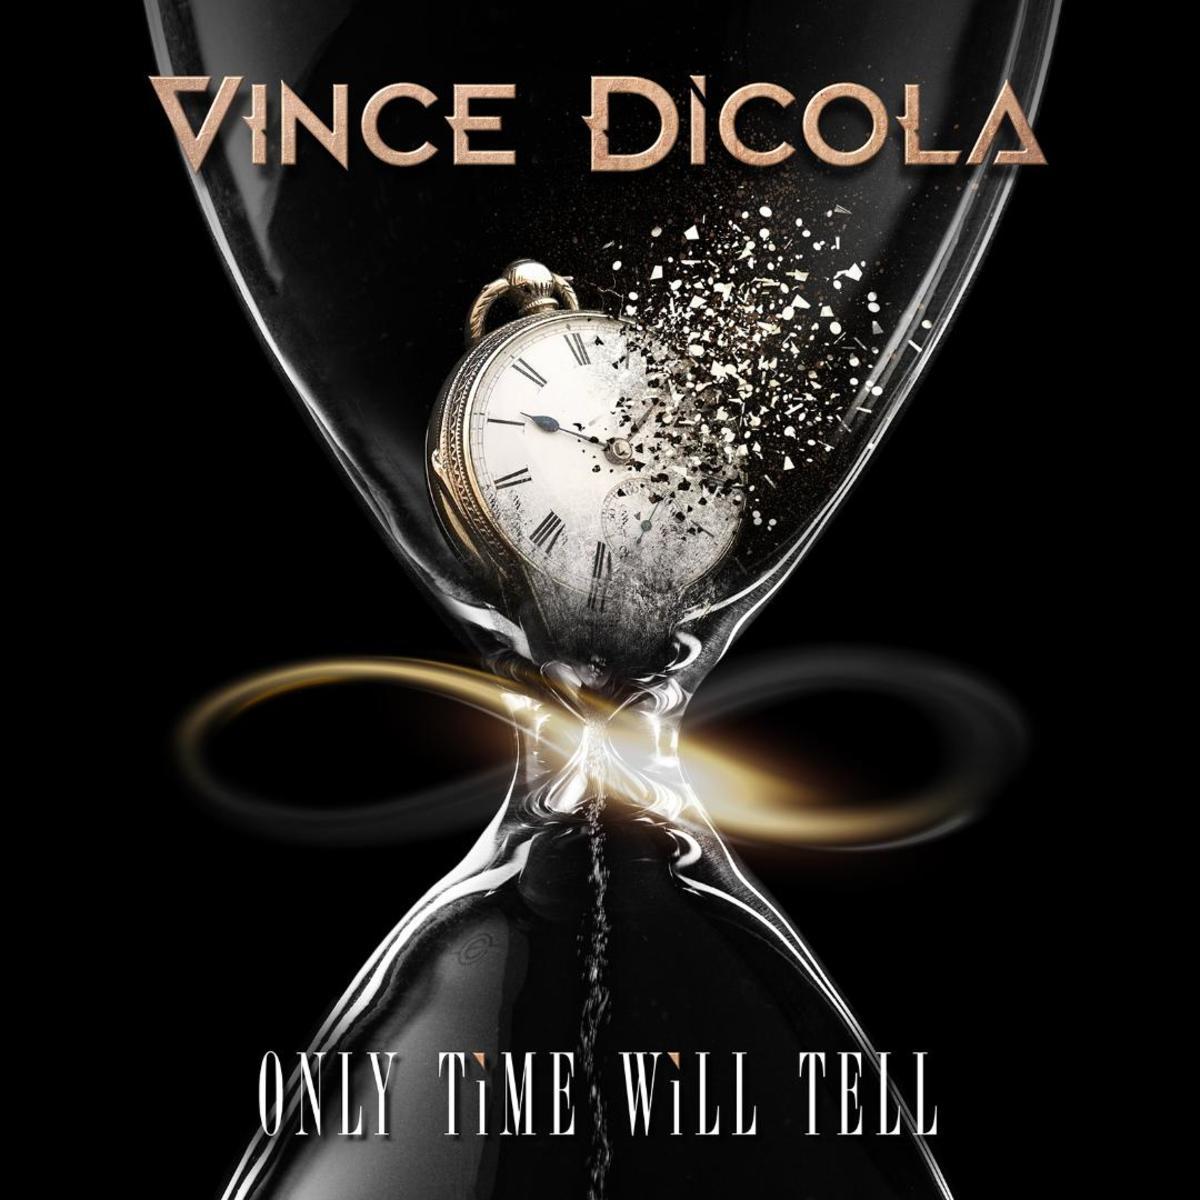 Vince DiCola album